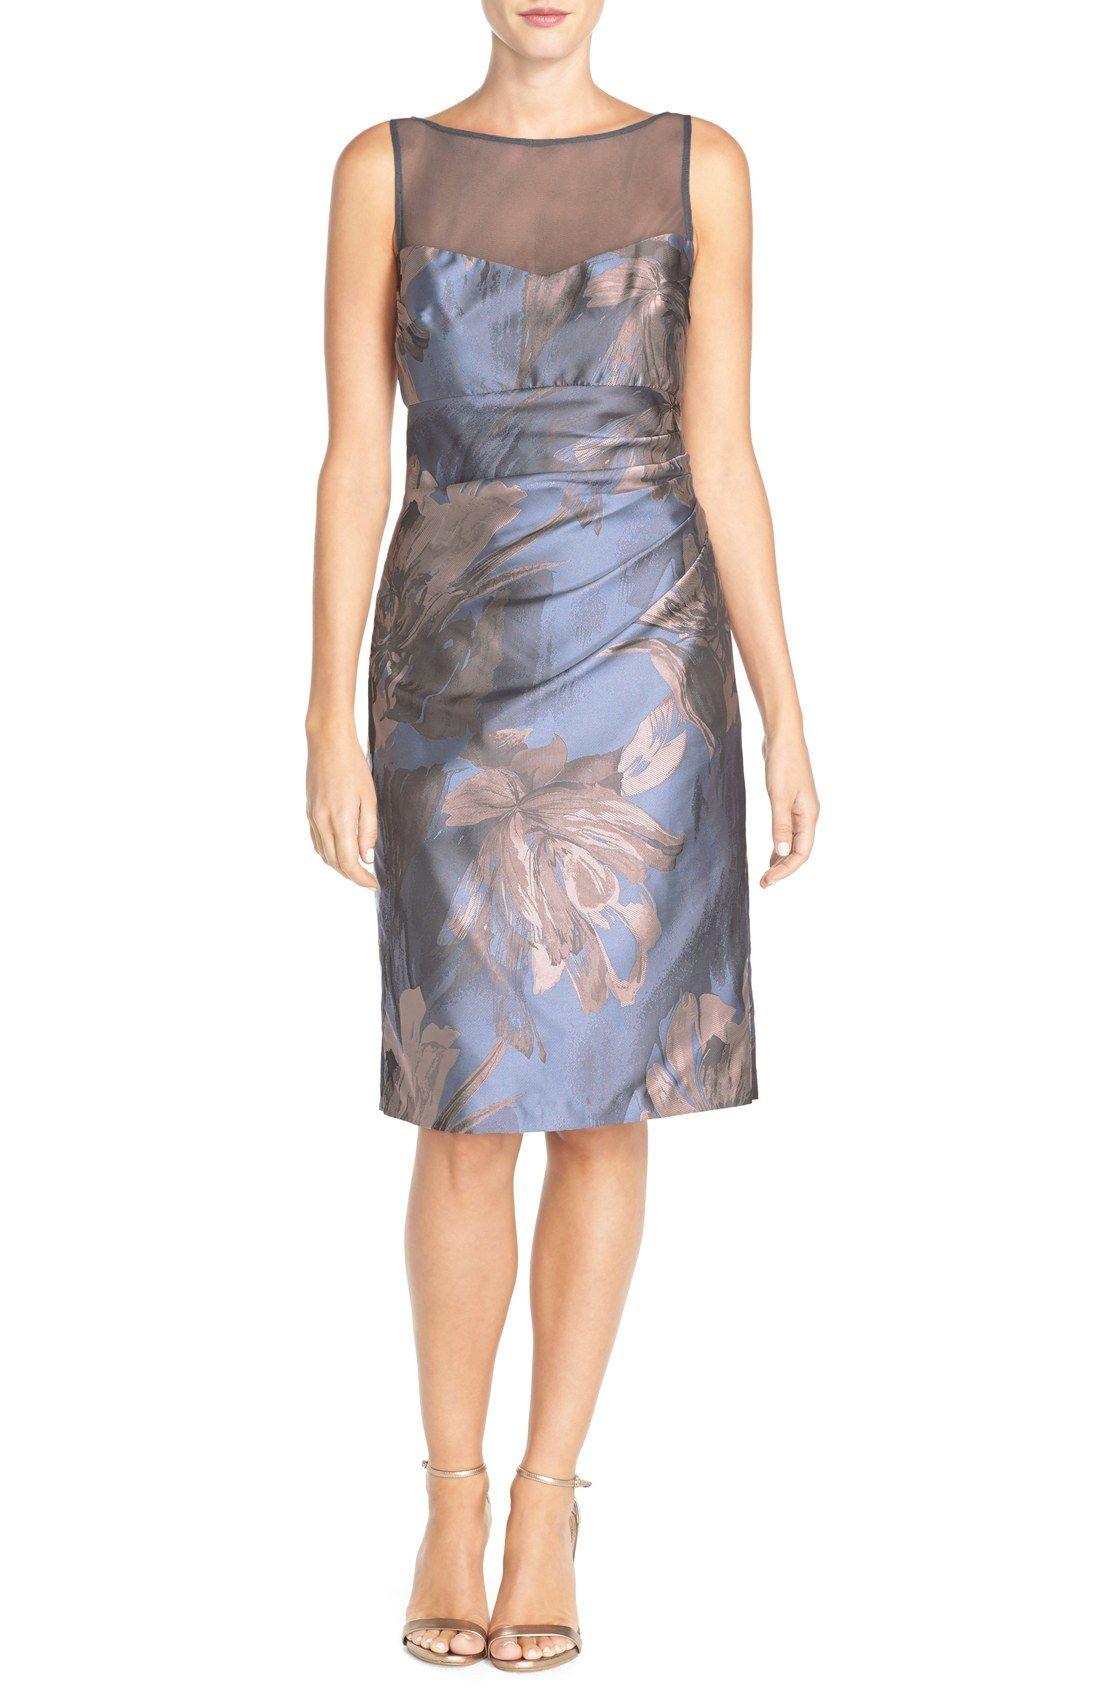 Petite dresses with sleeves for weddings  Maggy London uSplashu Floral Jacquard Sheath Dress Regular u Petite